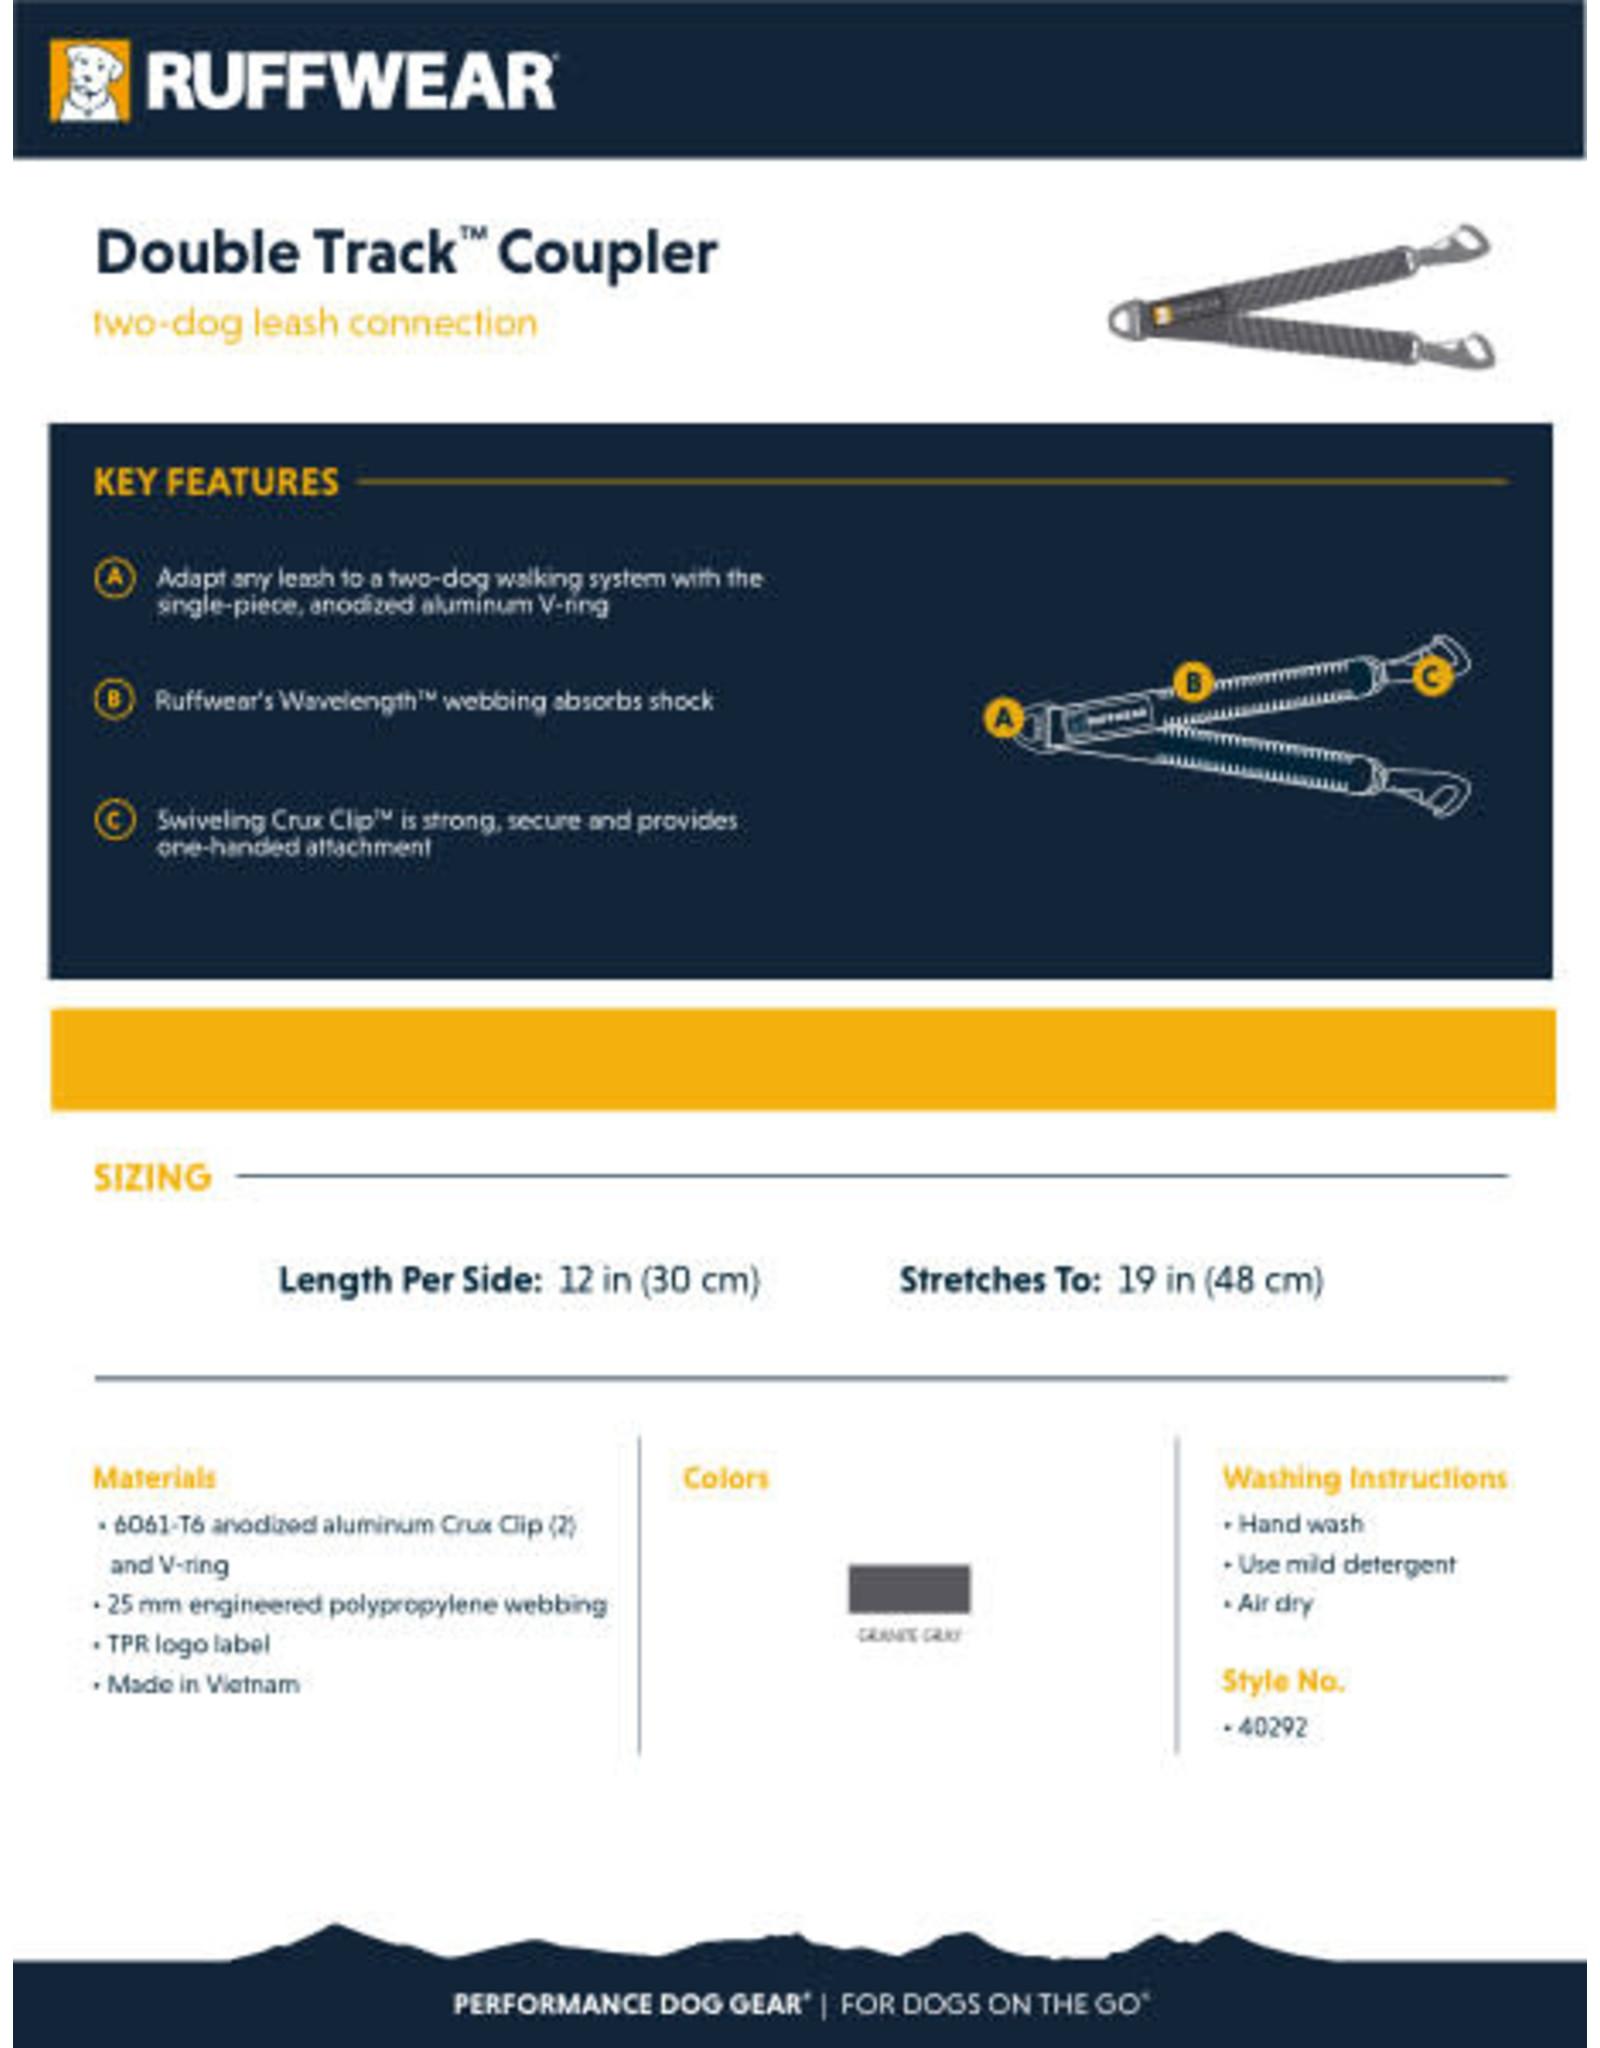 Ruffwear Double Track Coupler: Granite Gray, os